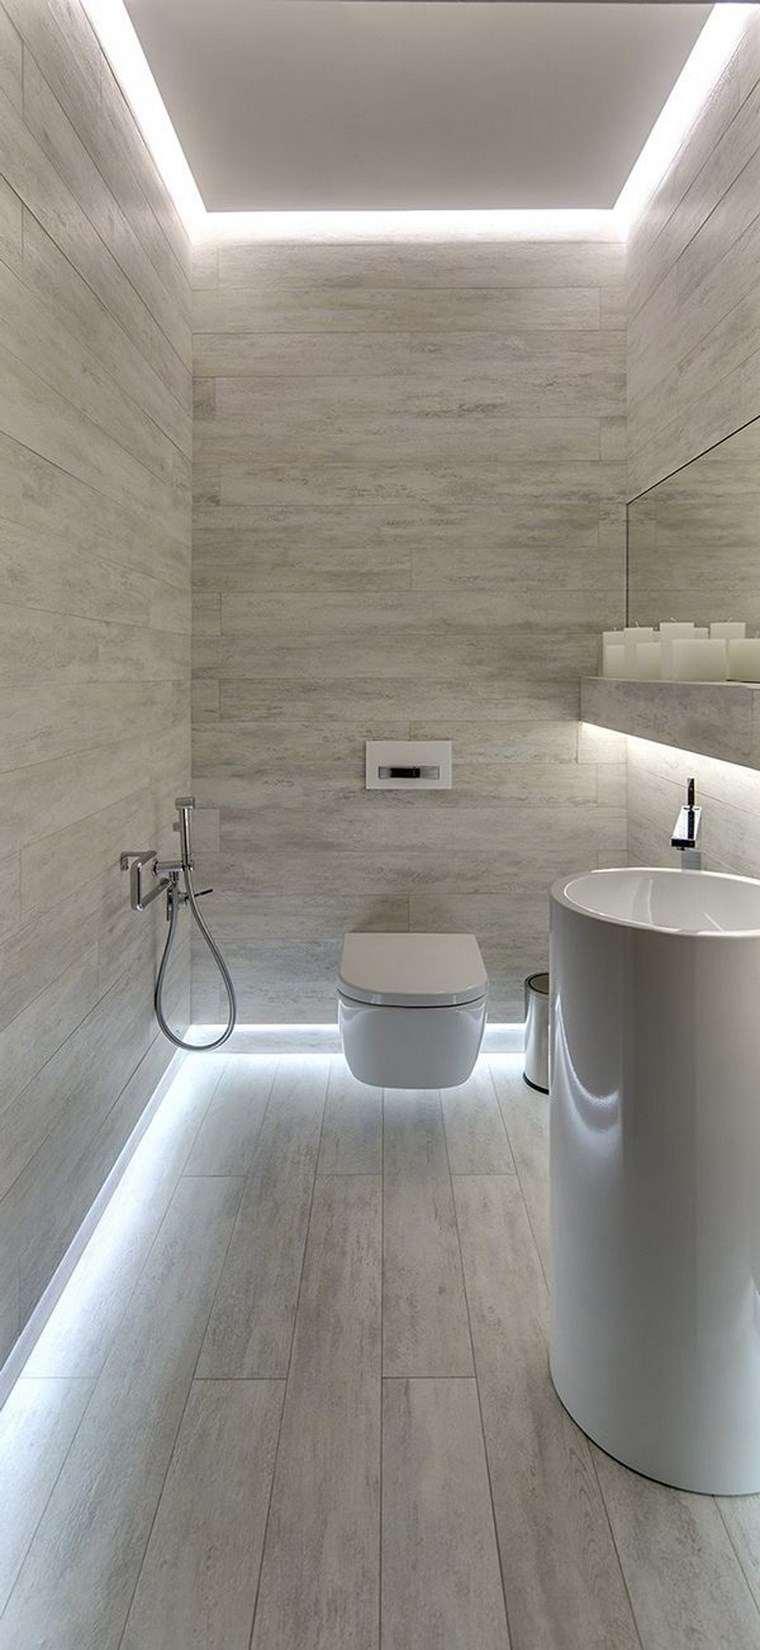 bano diseno moderno iluminacion original techo suelo LED ideas